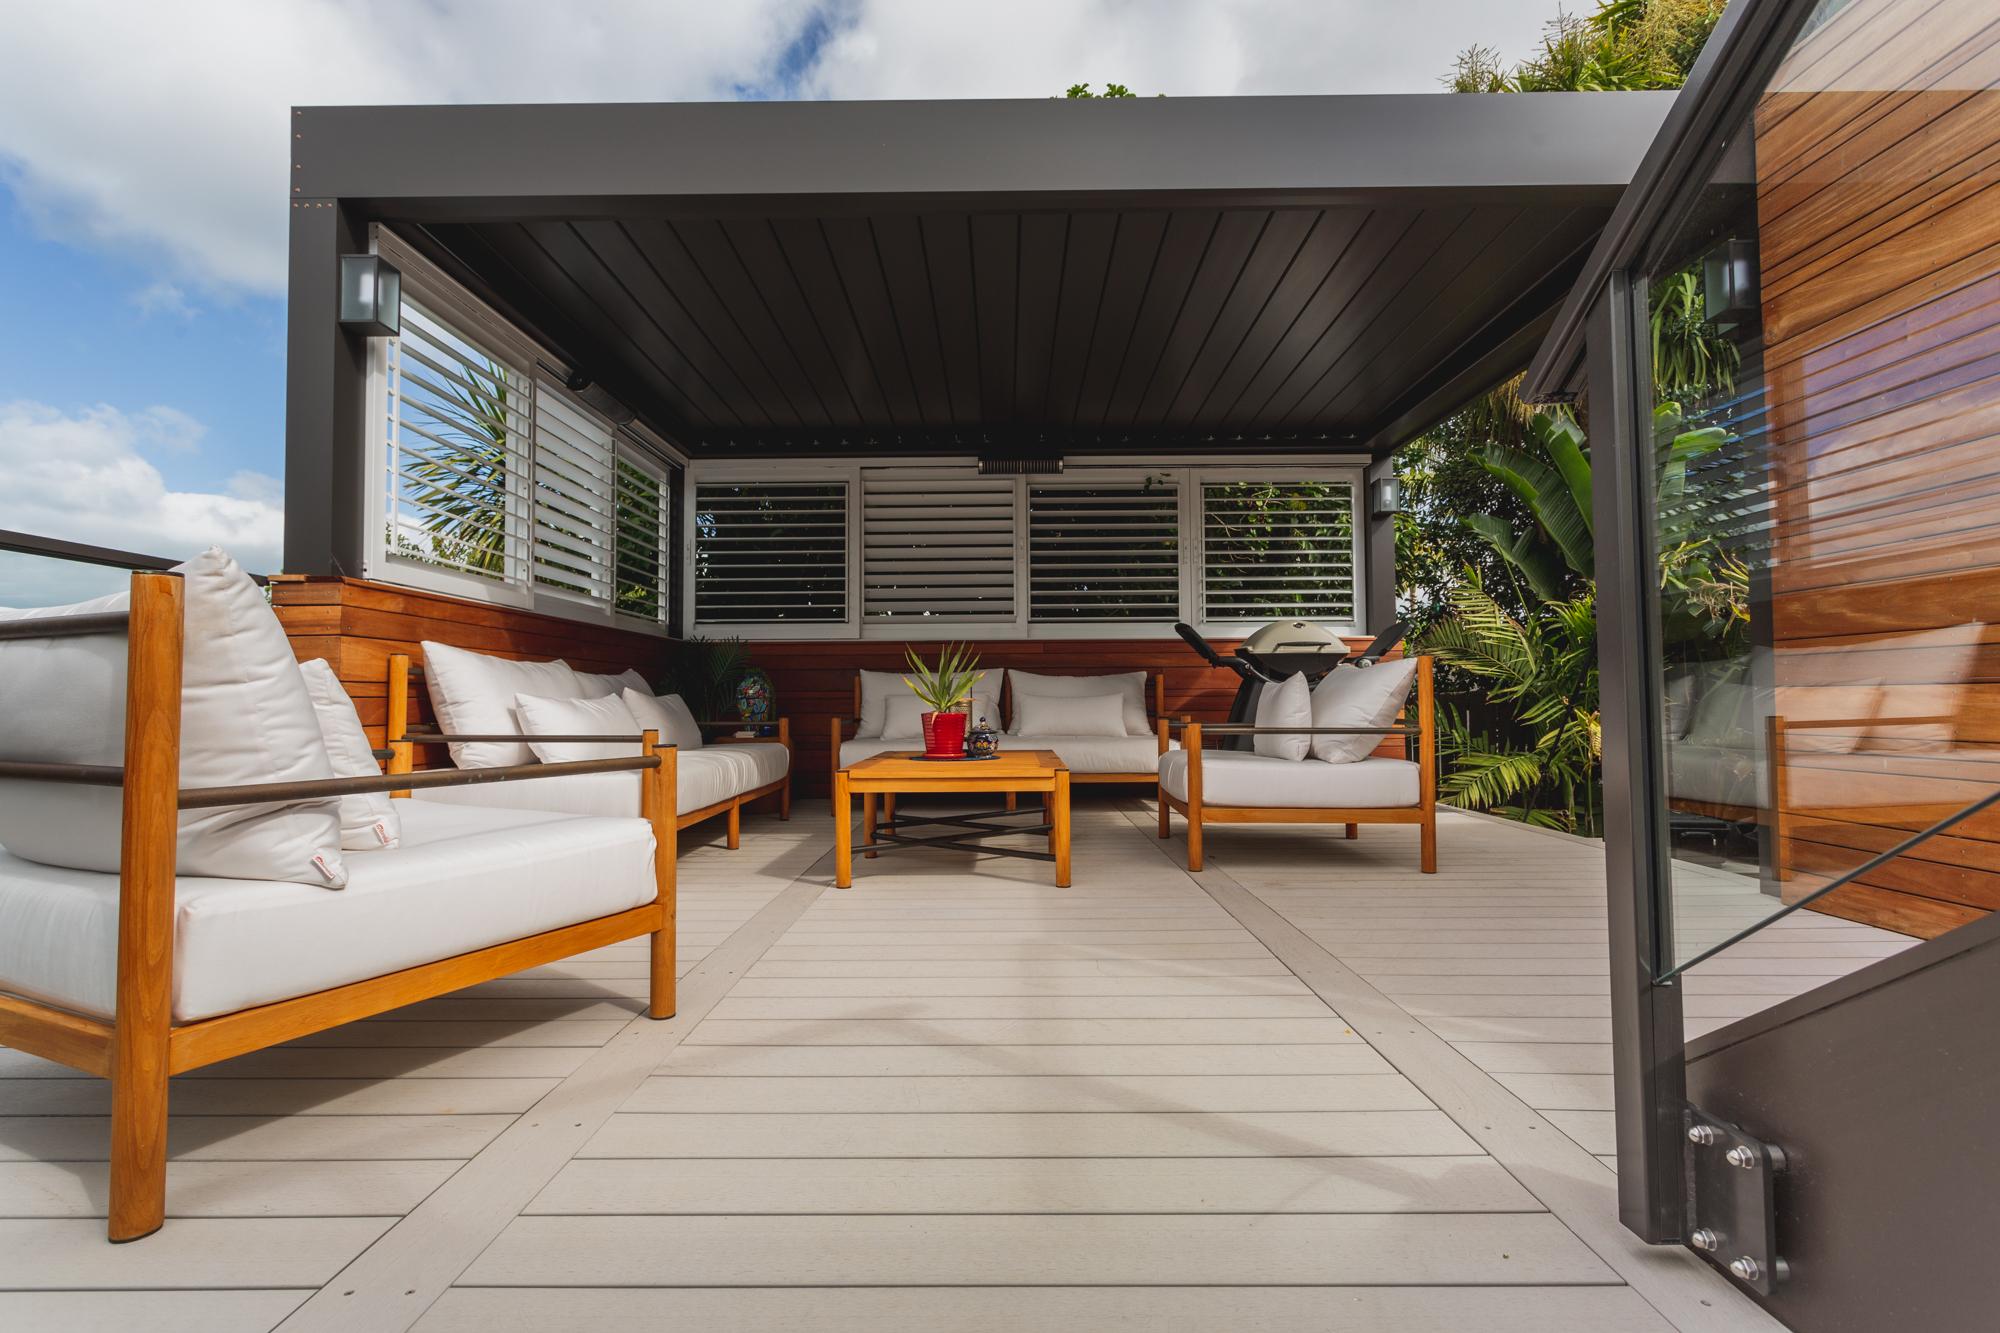 Clean and elegant composite decking